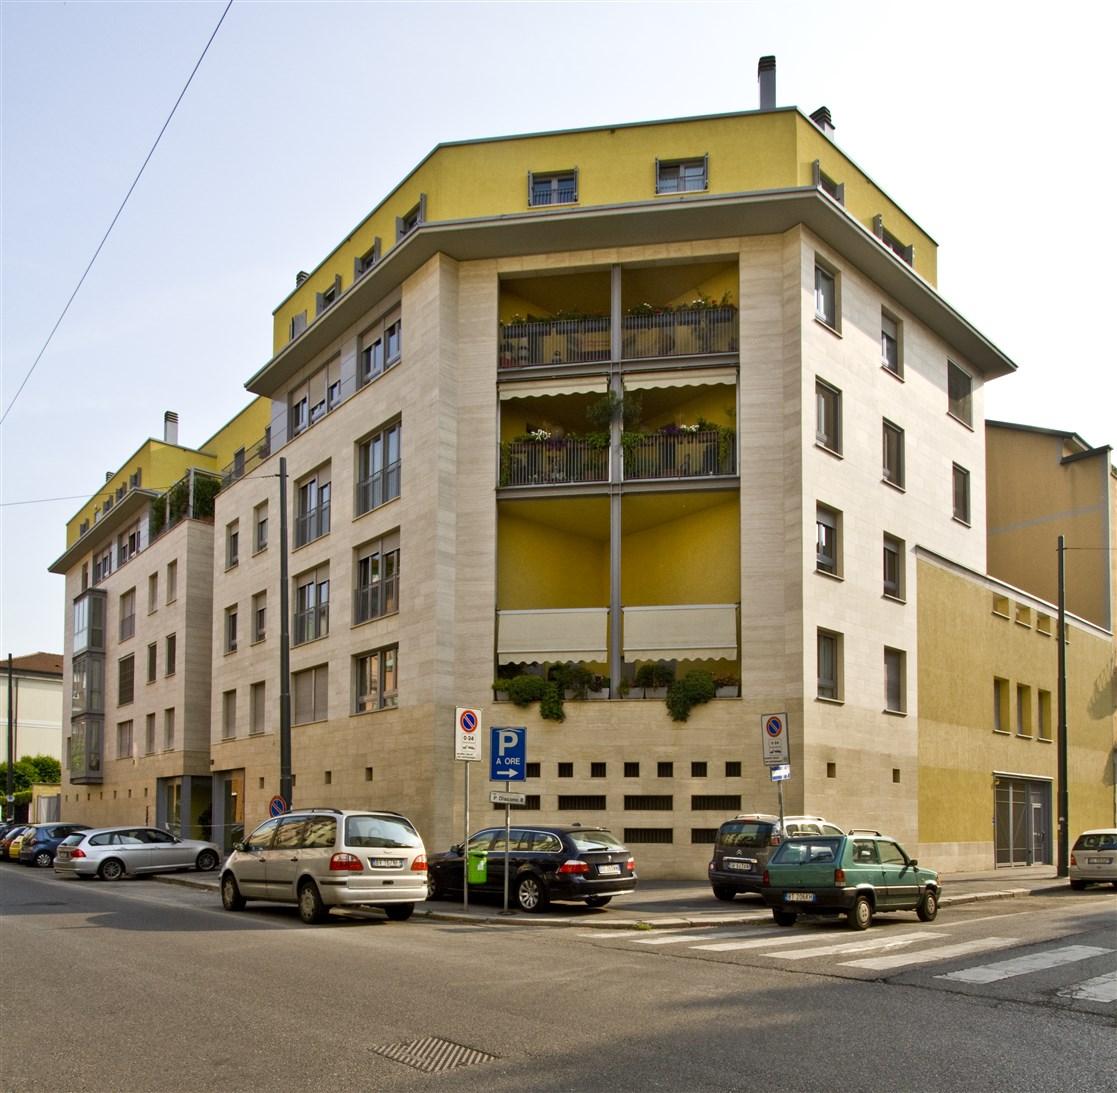 2000 - Via Pinturicchio 26